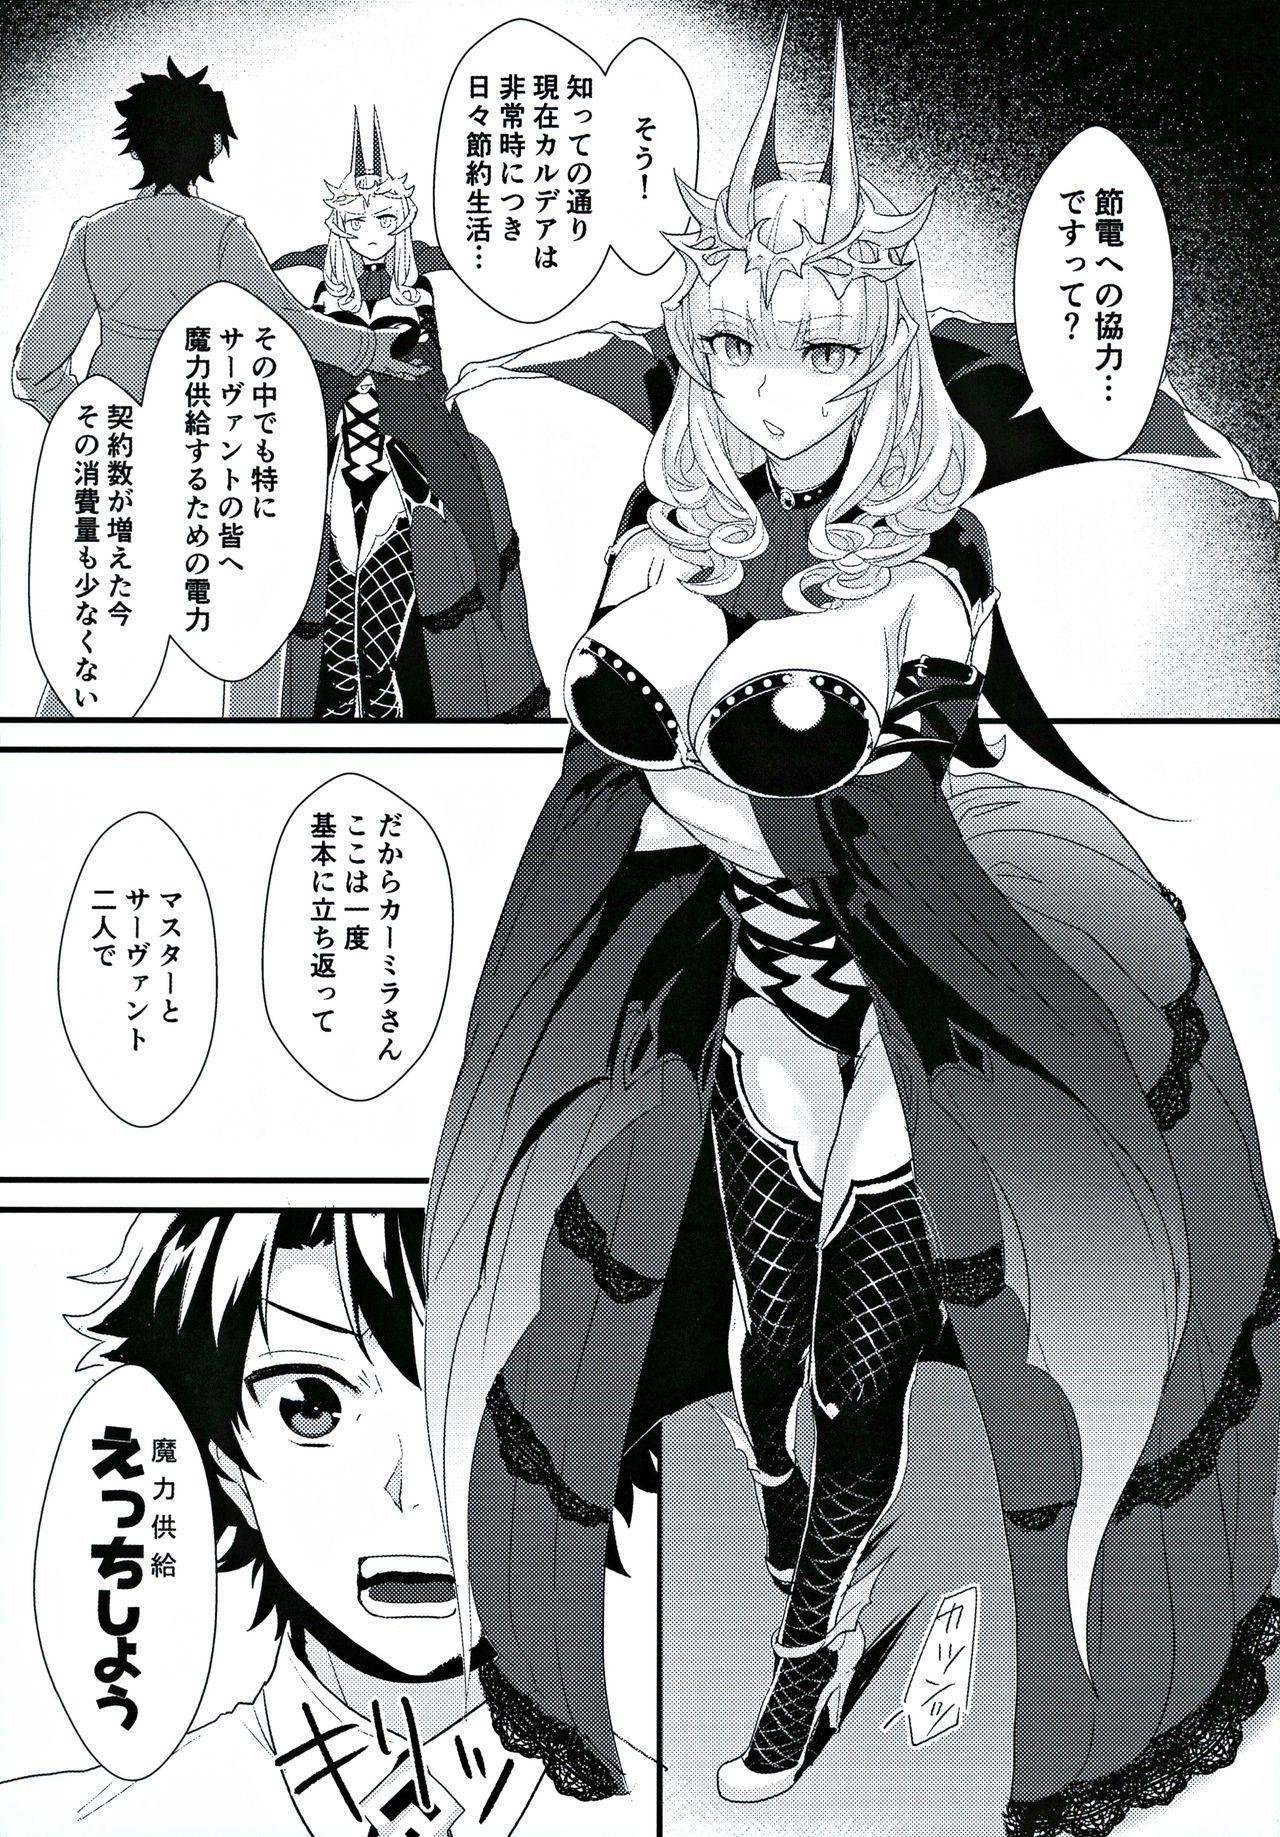 Carmilla-san to Ichaicha Shitai! 3